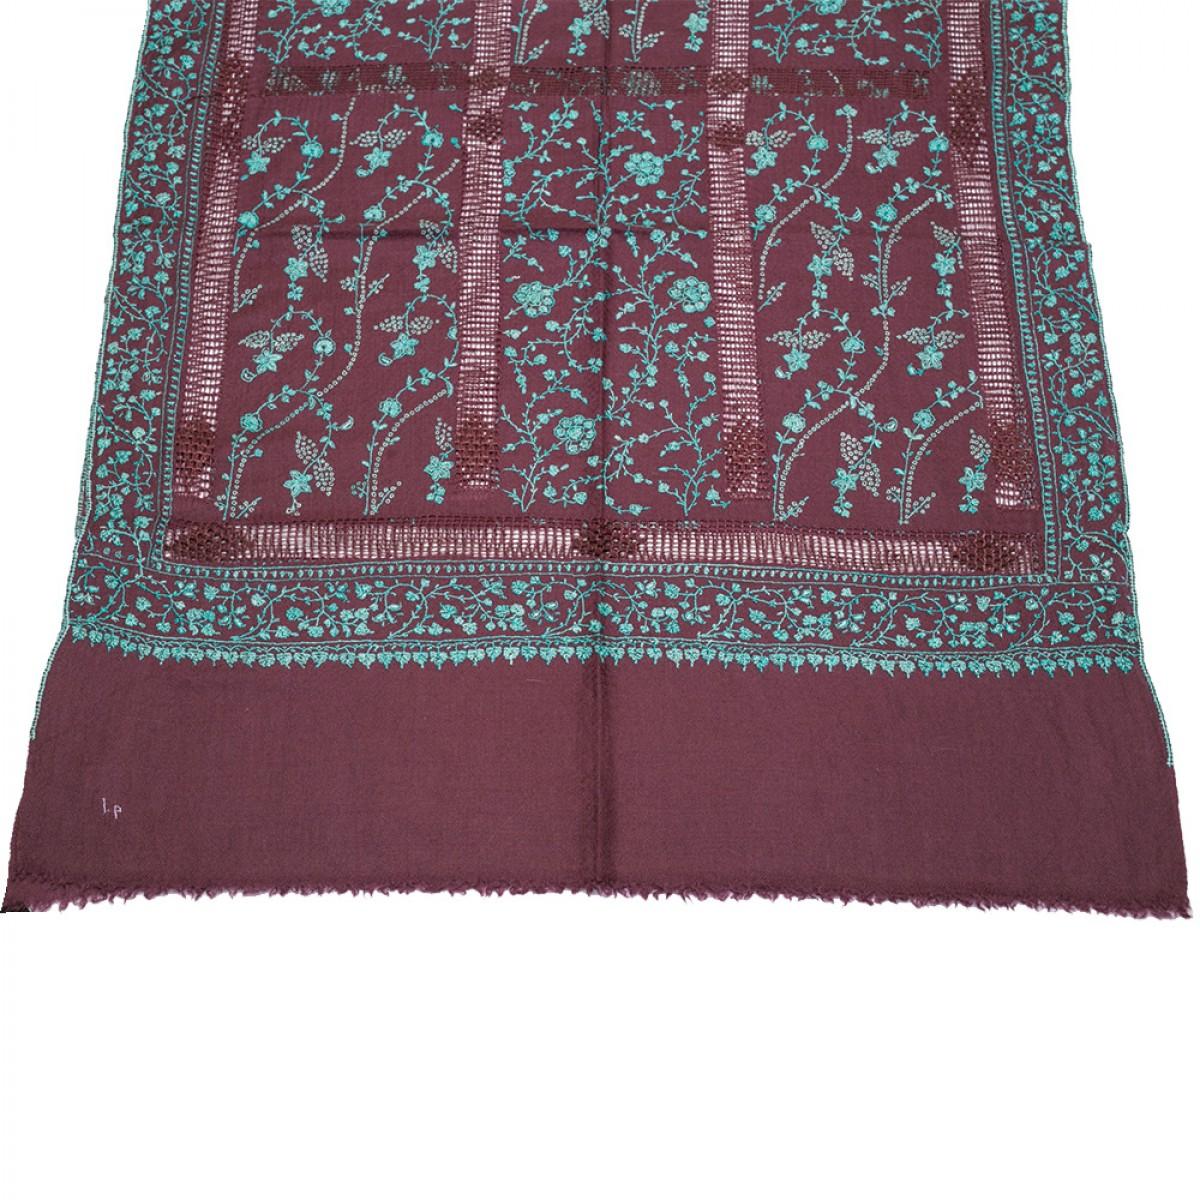 Embroidered Pashmina Stole - Wine & Turquoise